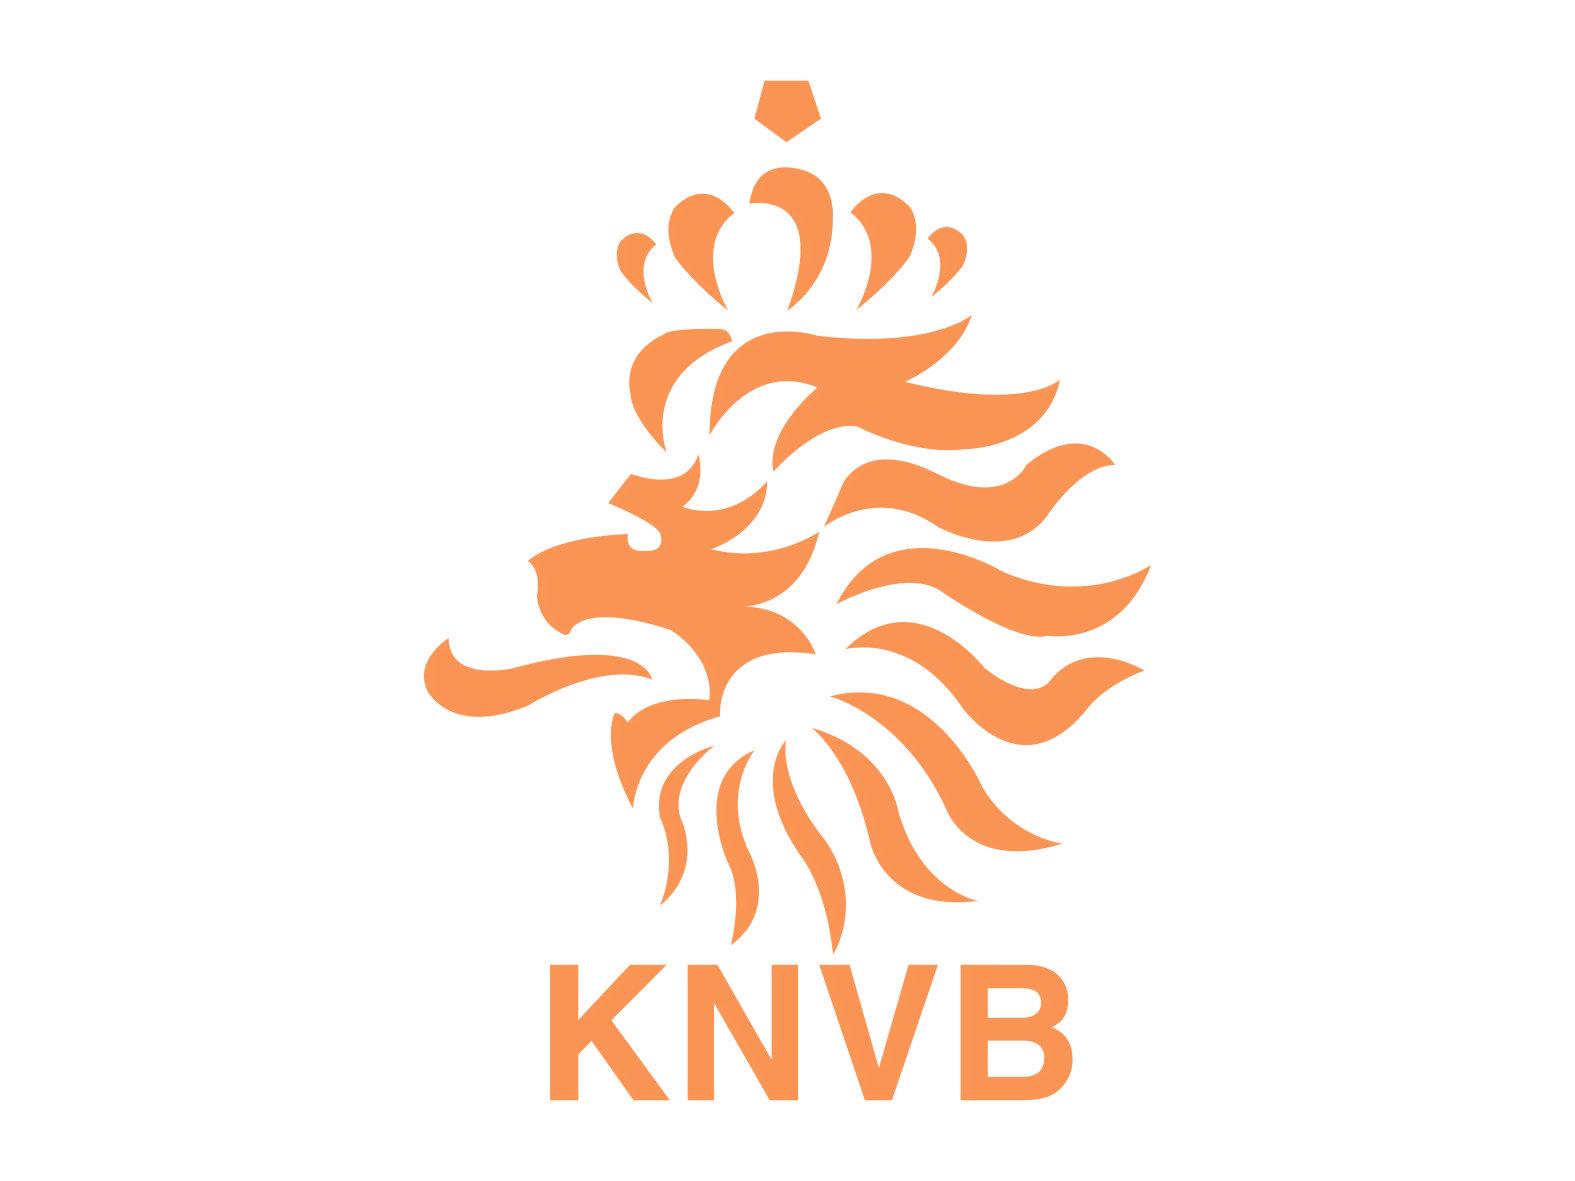 logo knvb vector cdr amp png hd gudril logo tempatnya